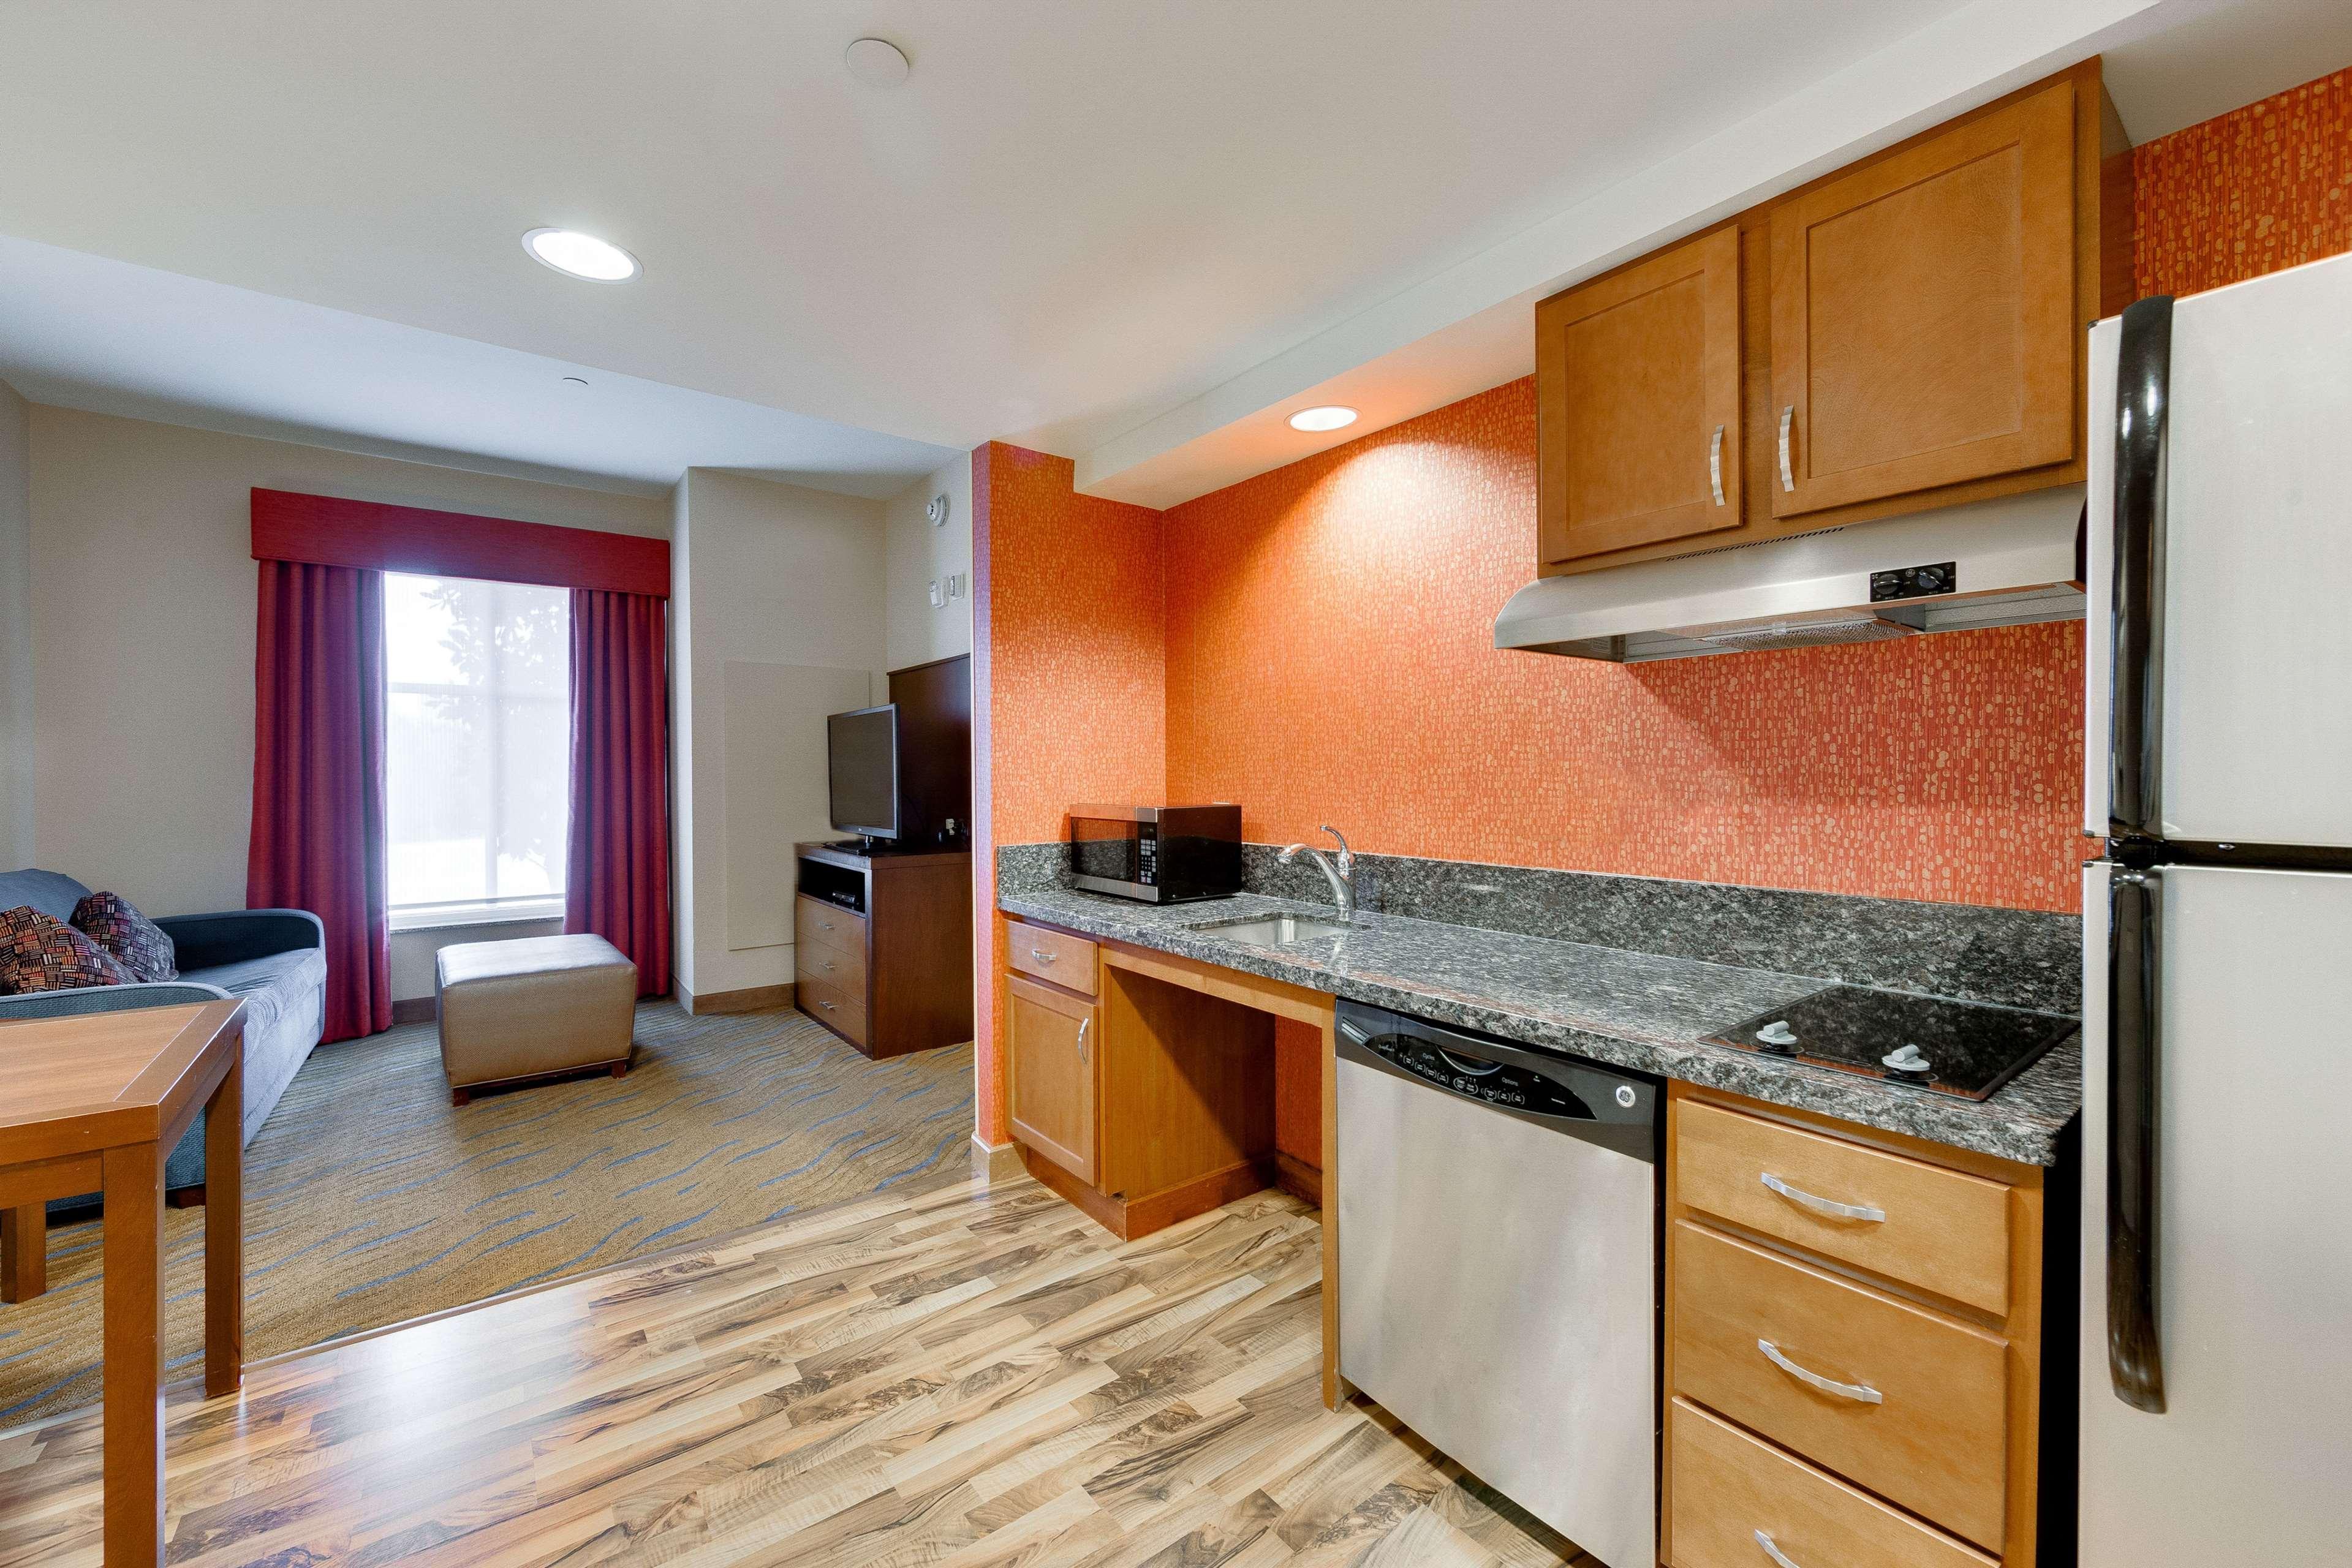 Homewood Suites by Hilton Fort Worth - Medical Center, TX image 15